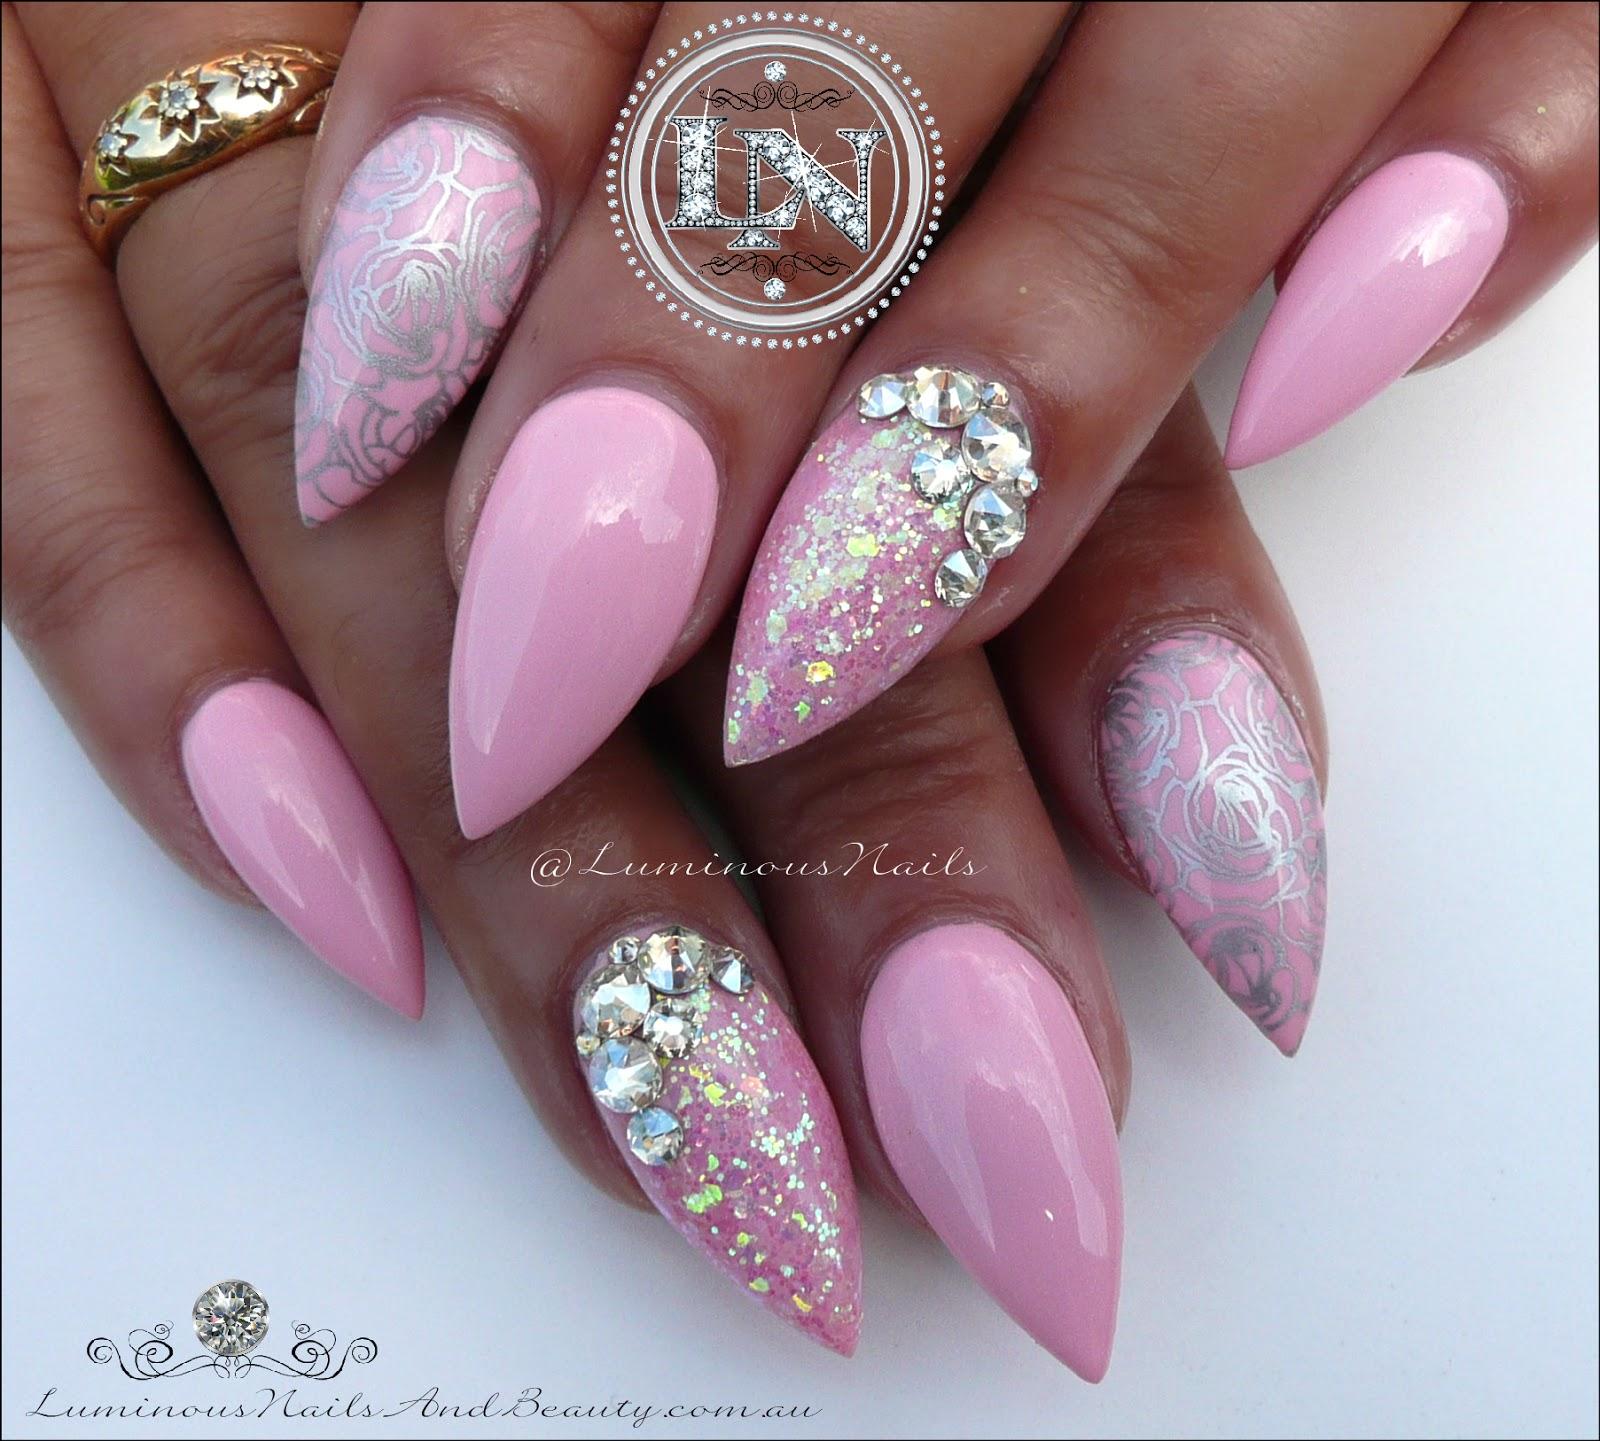 Pink and silver nails - Luminous Nails Plush Pink Silver Acrylic Gel